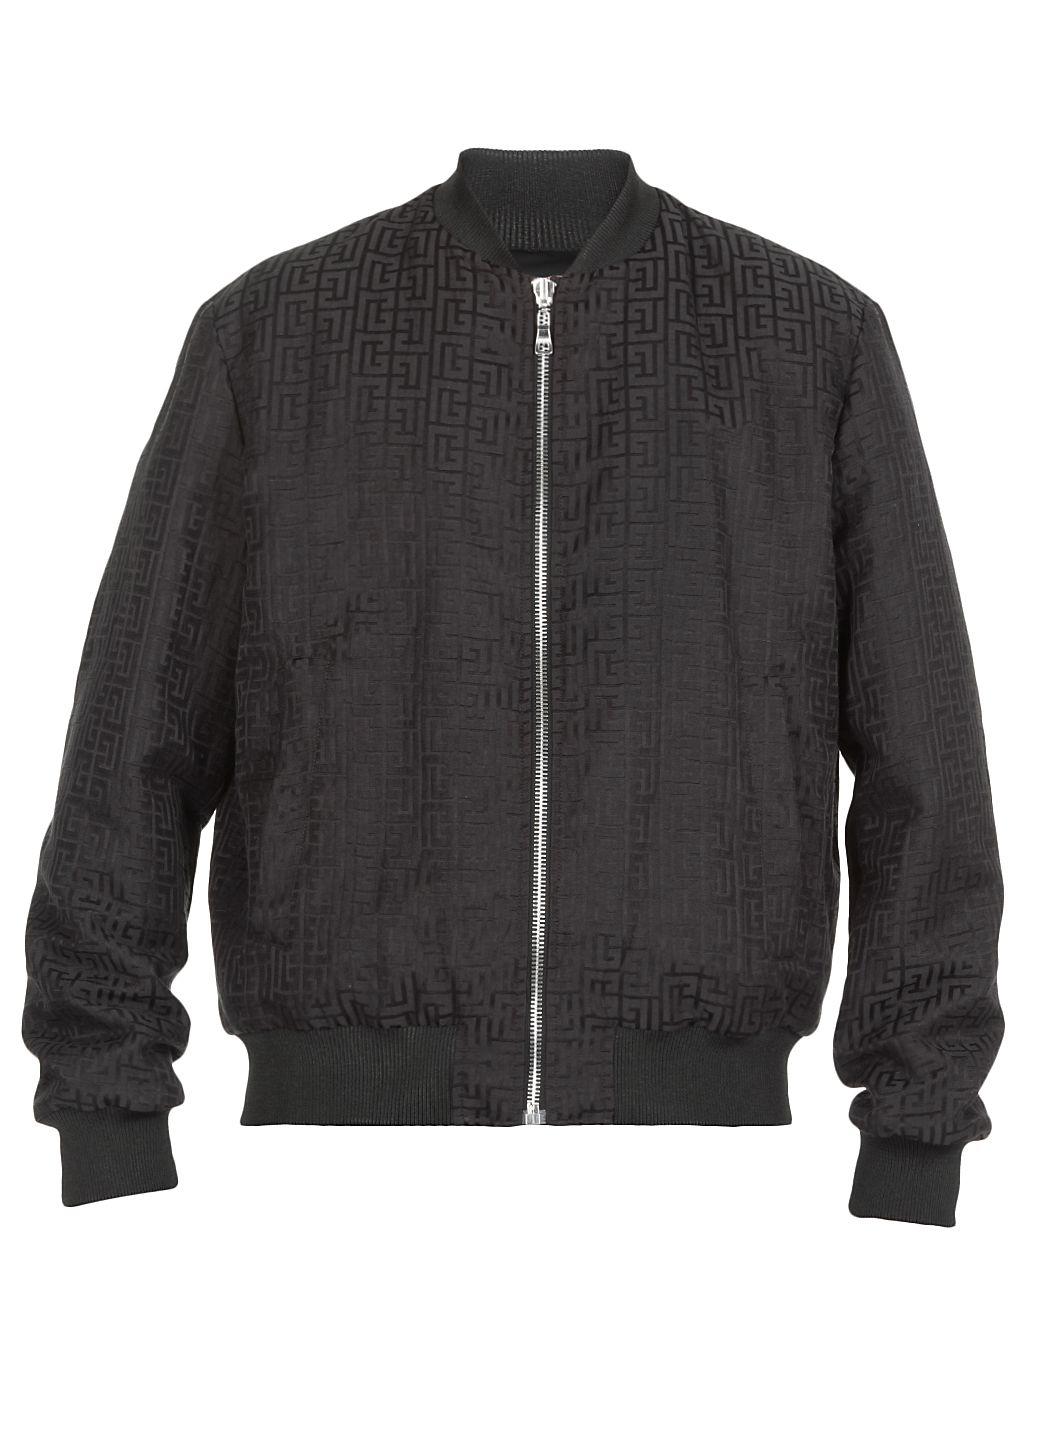 Jacket with monogram